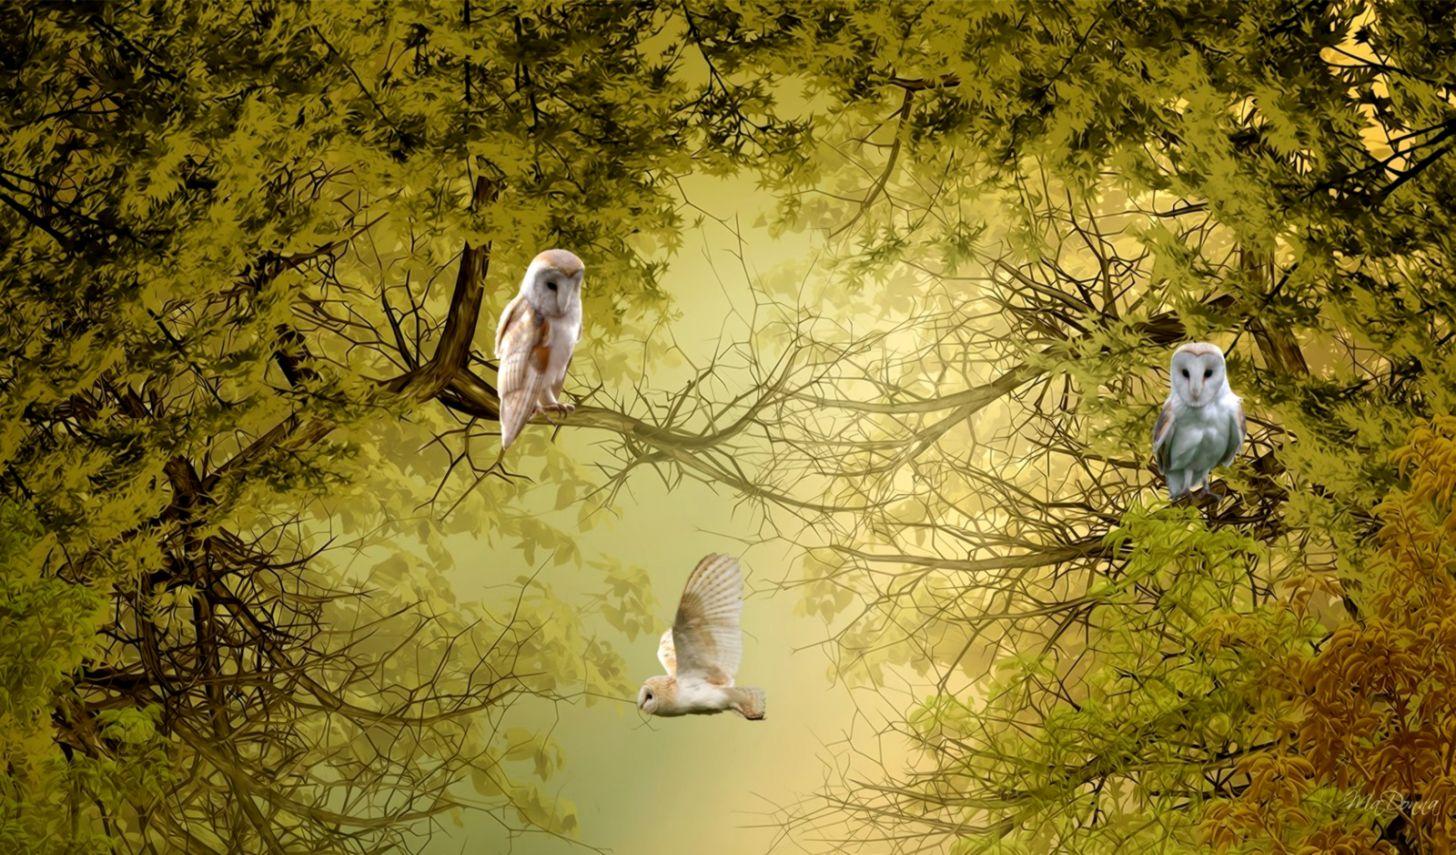 Nature trees birds owls wallpaper 6807 PC en